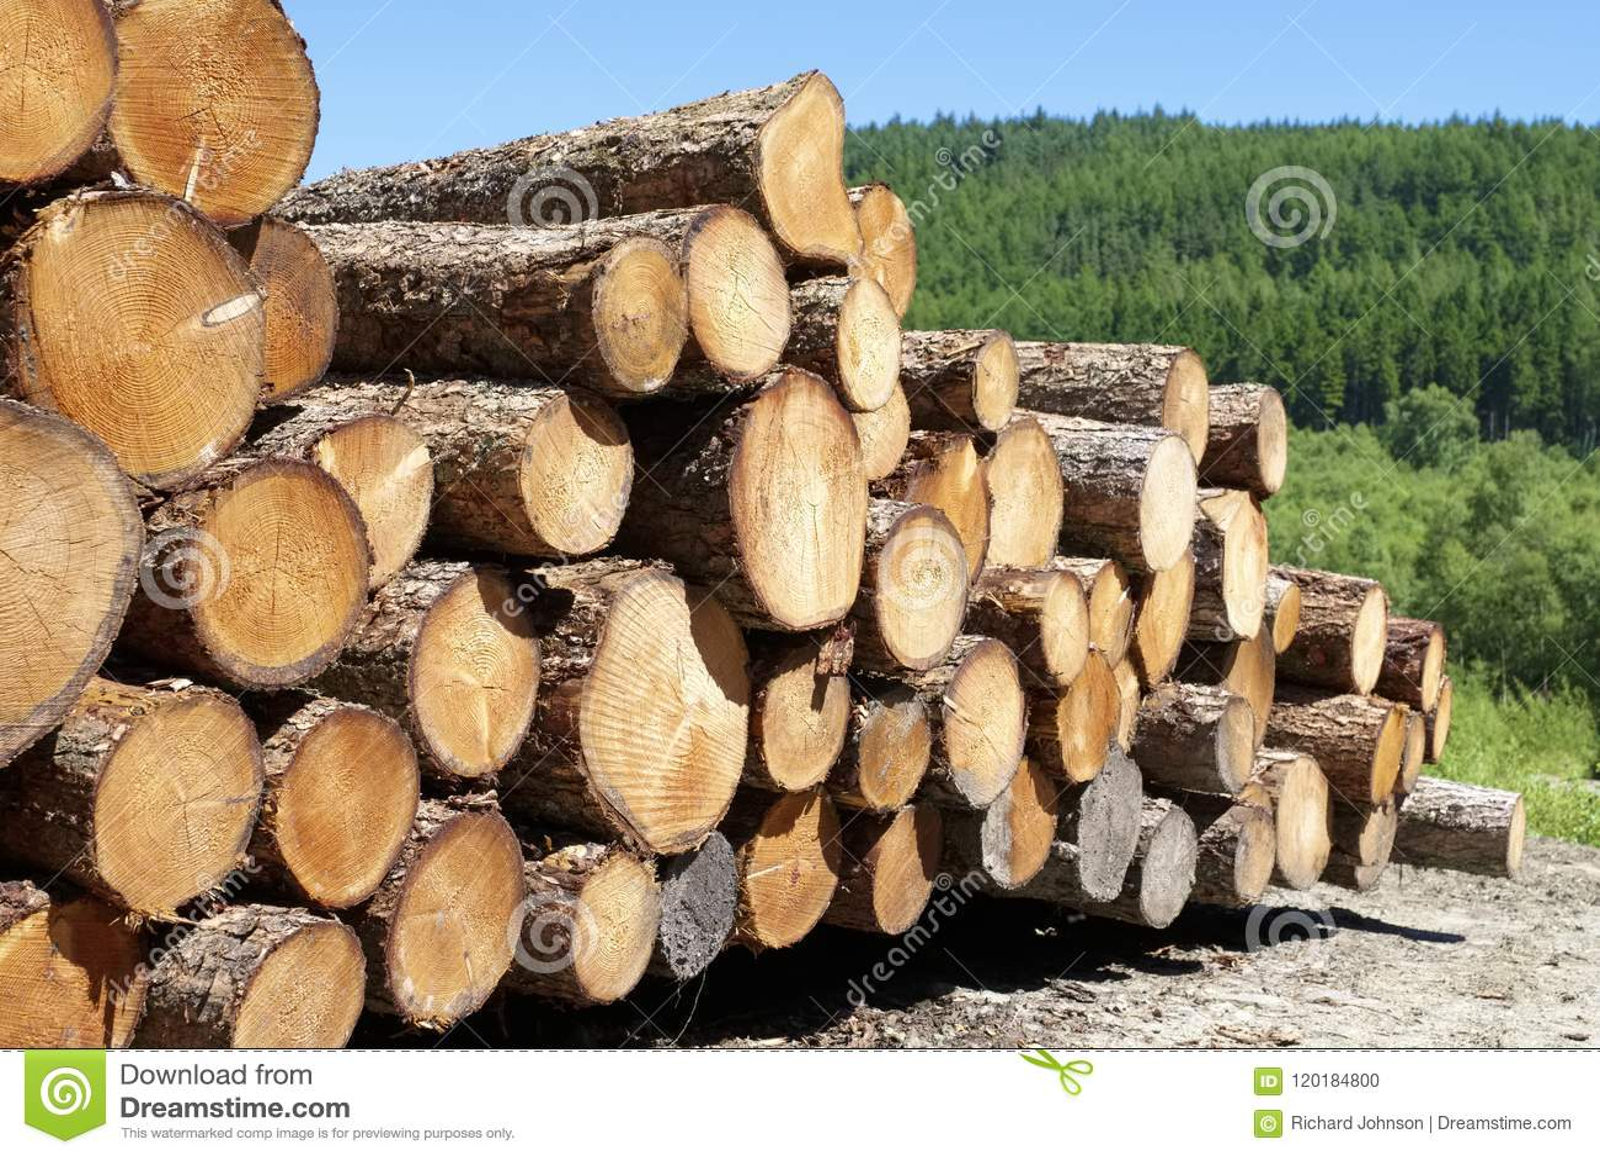 Chopped wood logs stacked in forest woodlands renewable green biomass energy summer sun Loch Lomond blue sky